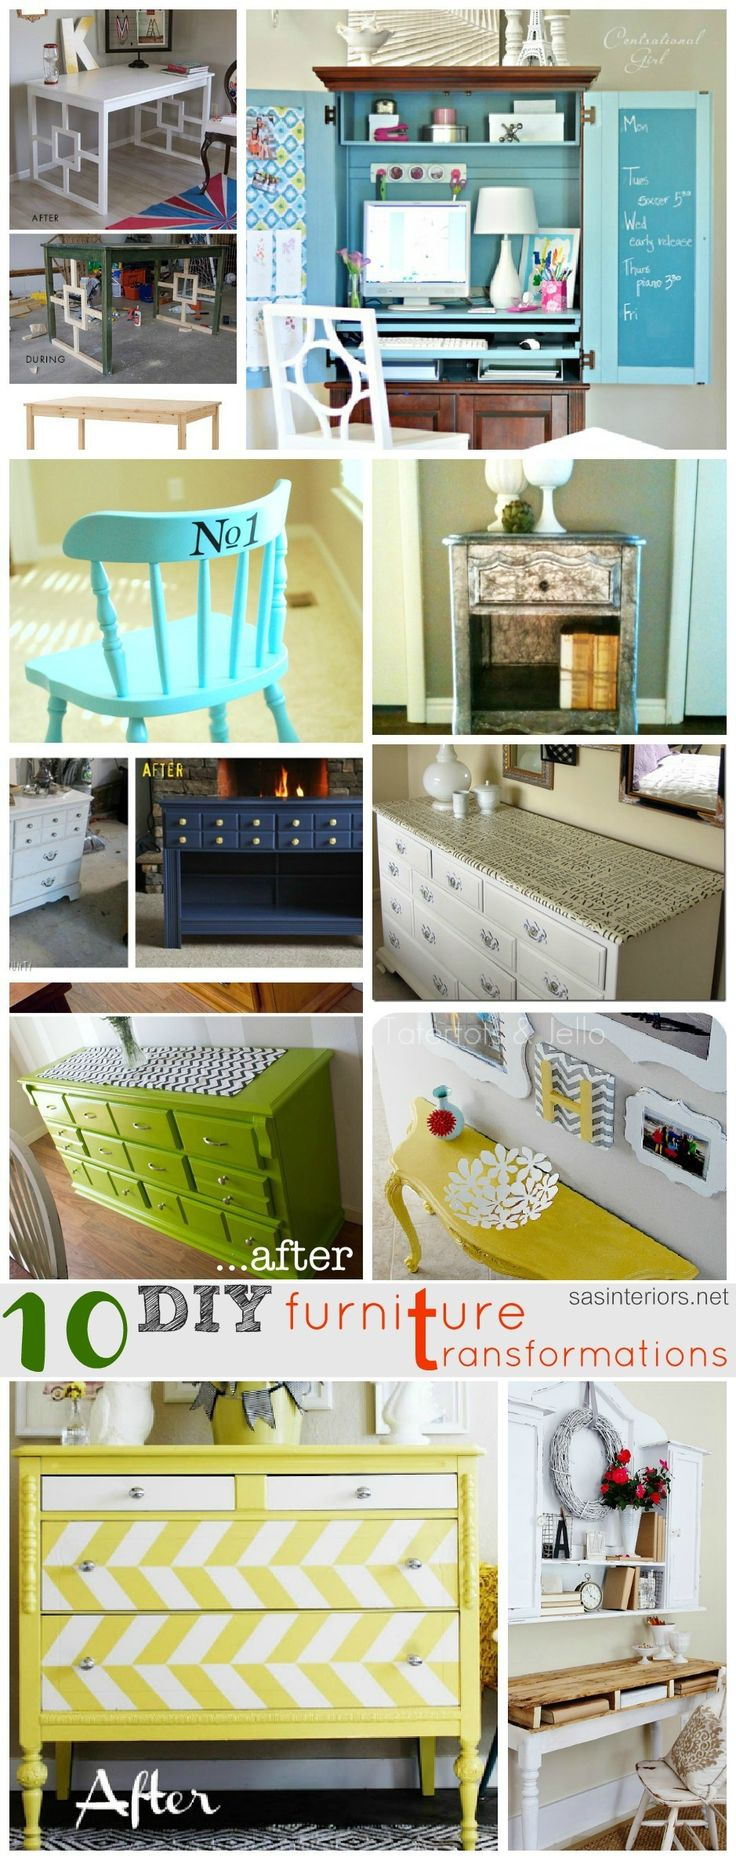 *10 Great DIY Furniture Transformations